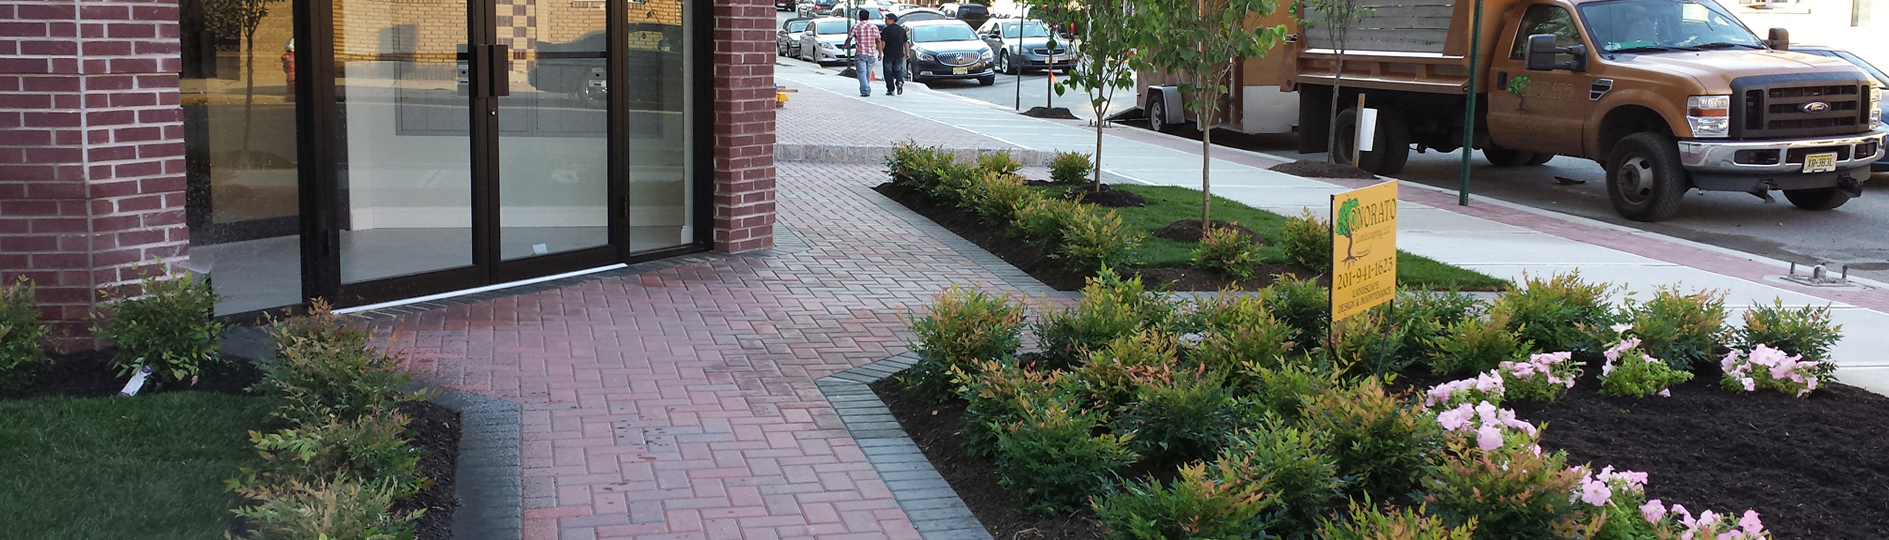 Commercial landscpaing for Bergen County NJ